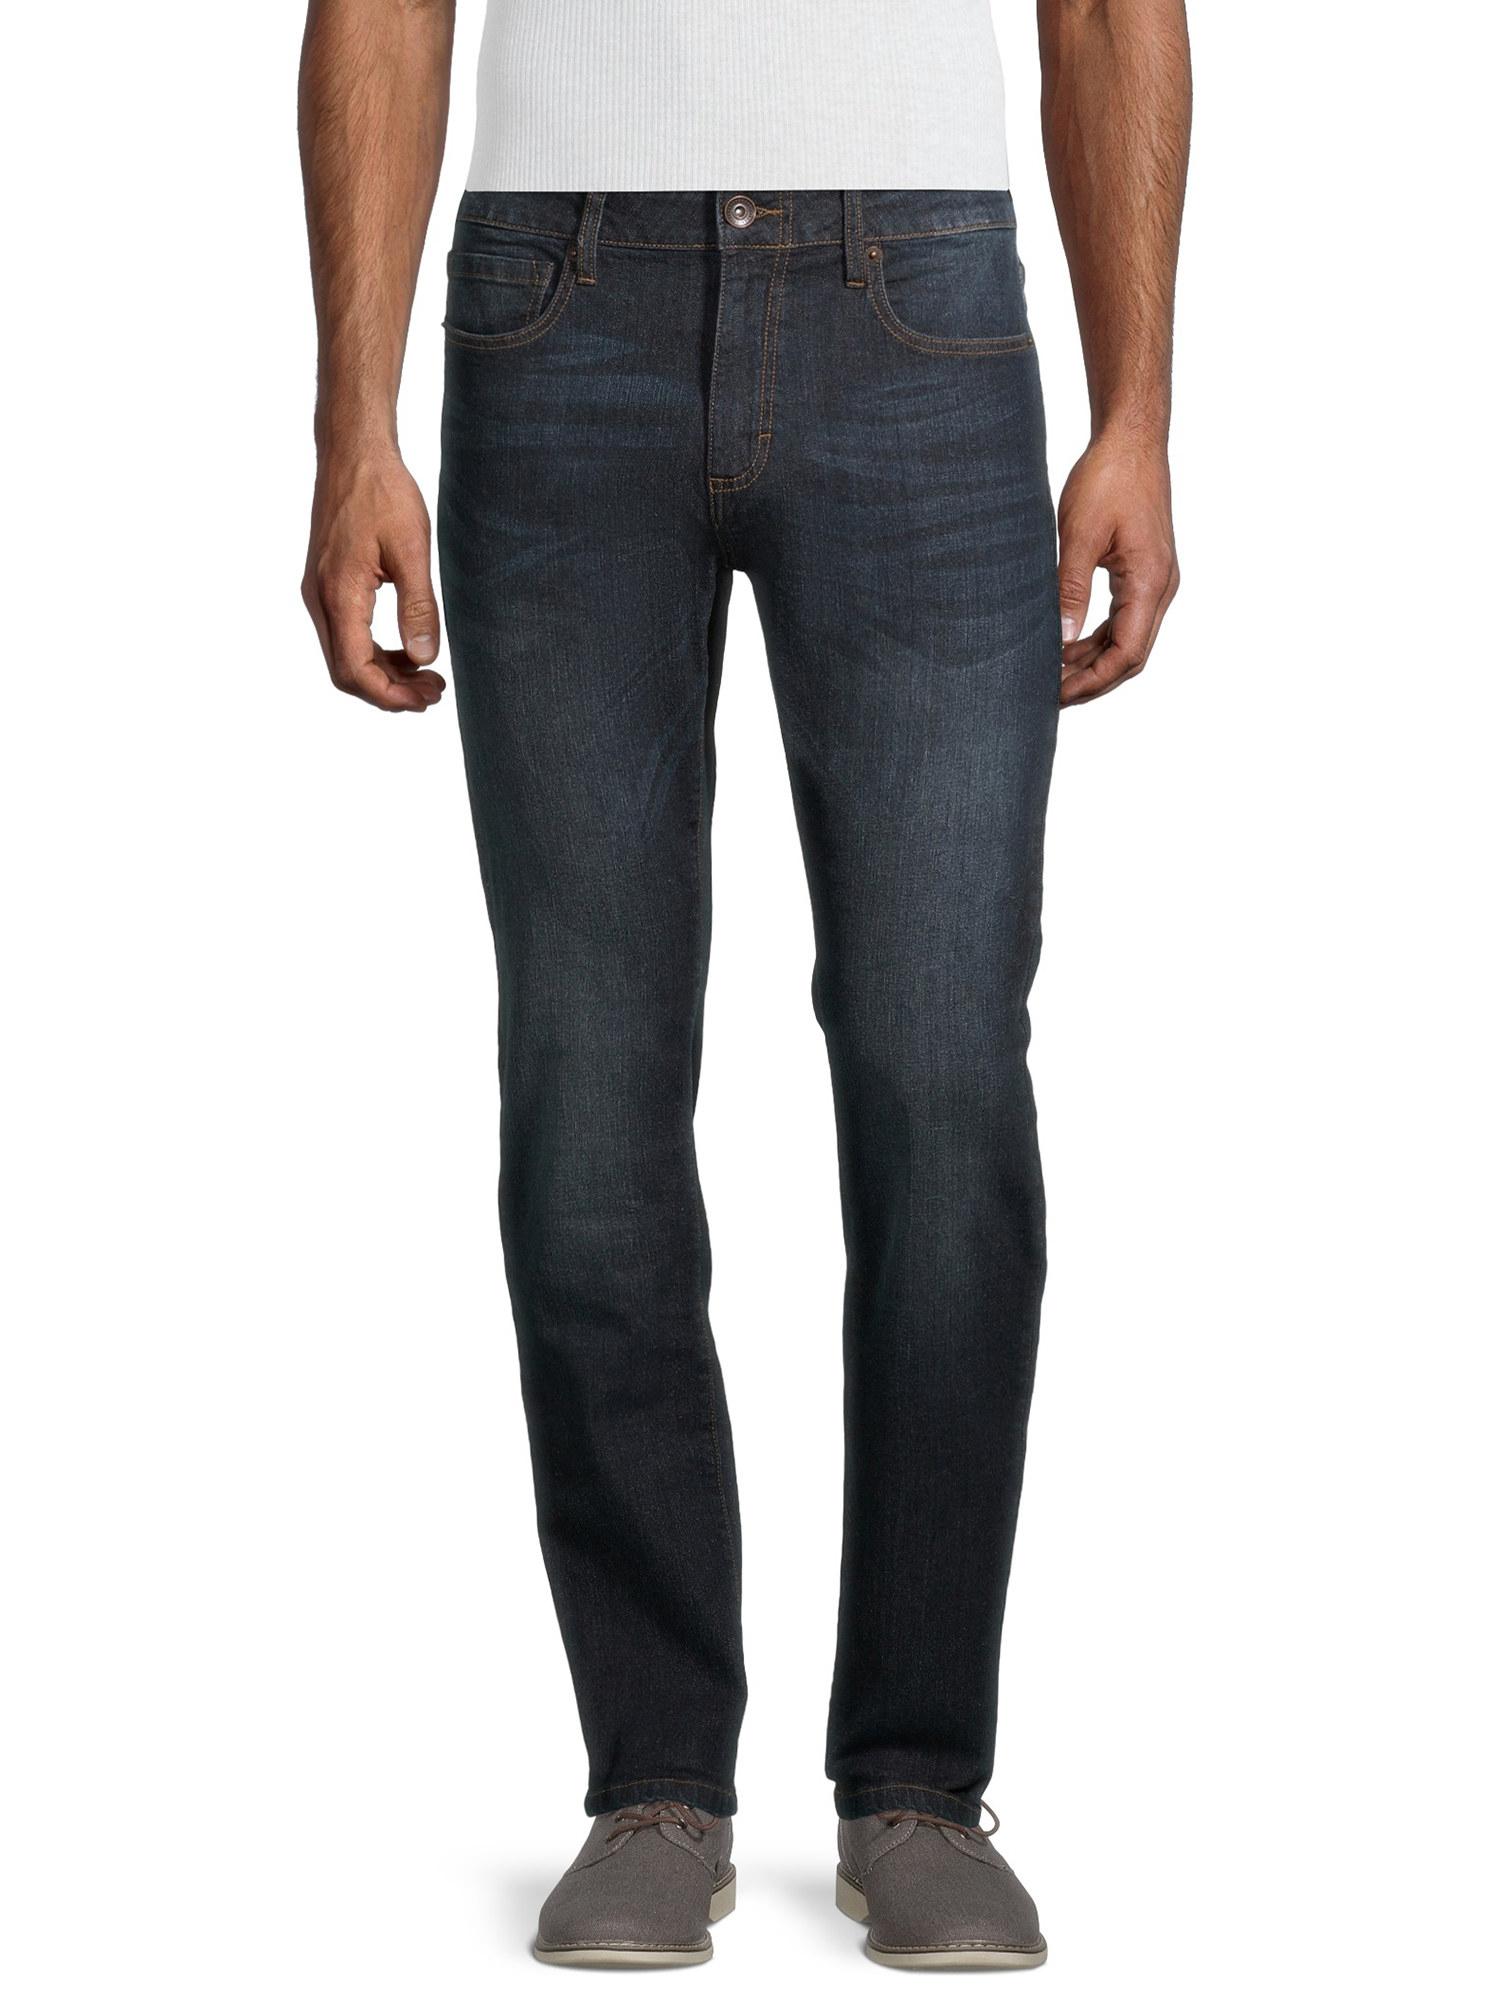 A model wearing the black skinny jeans